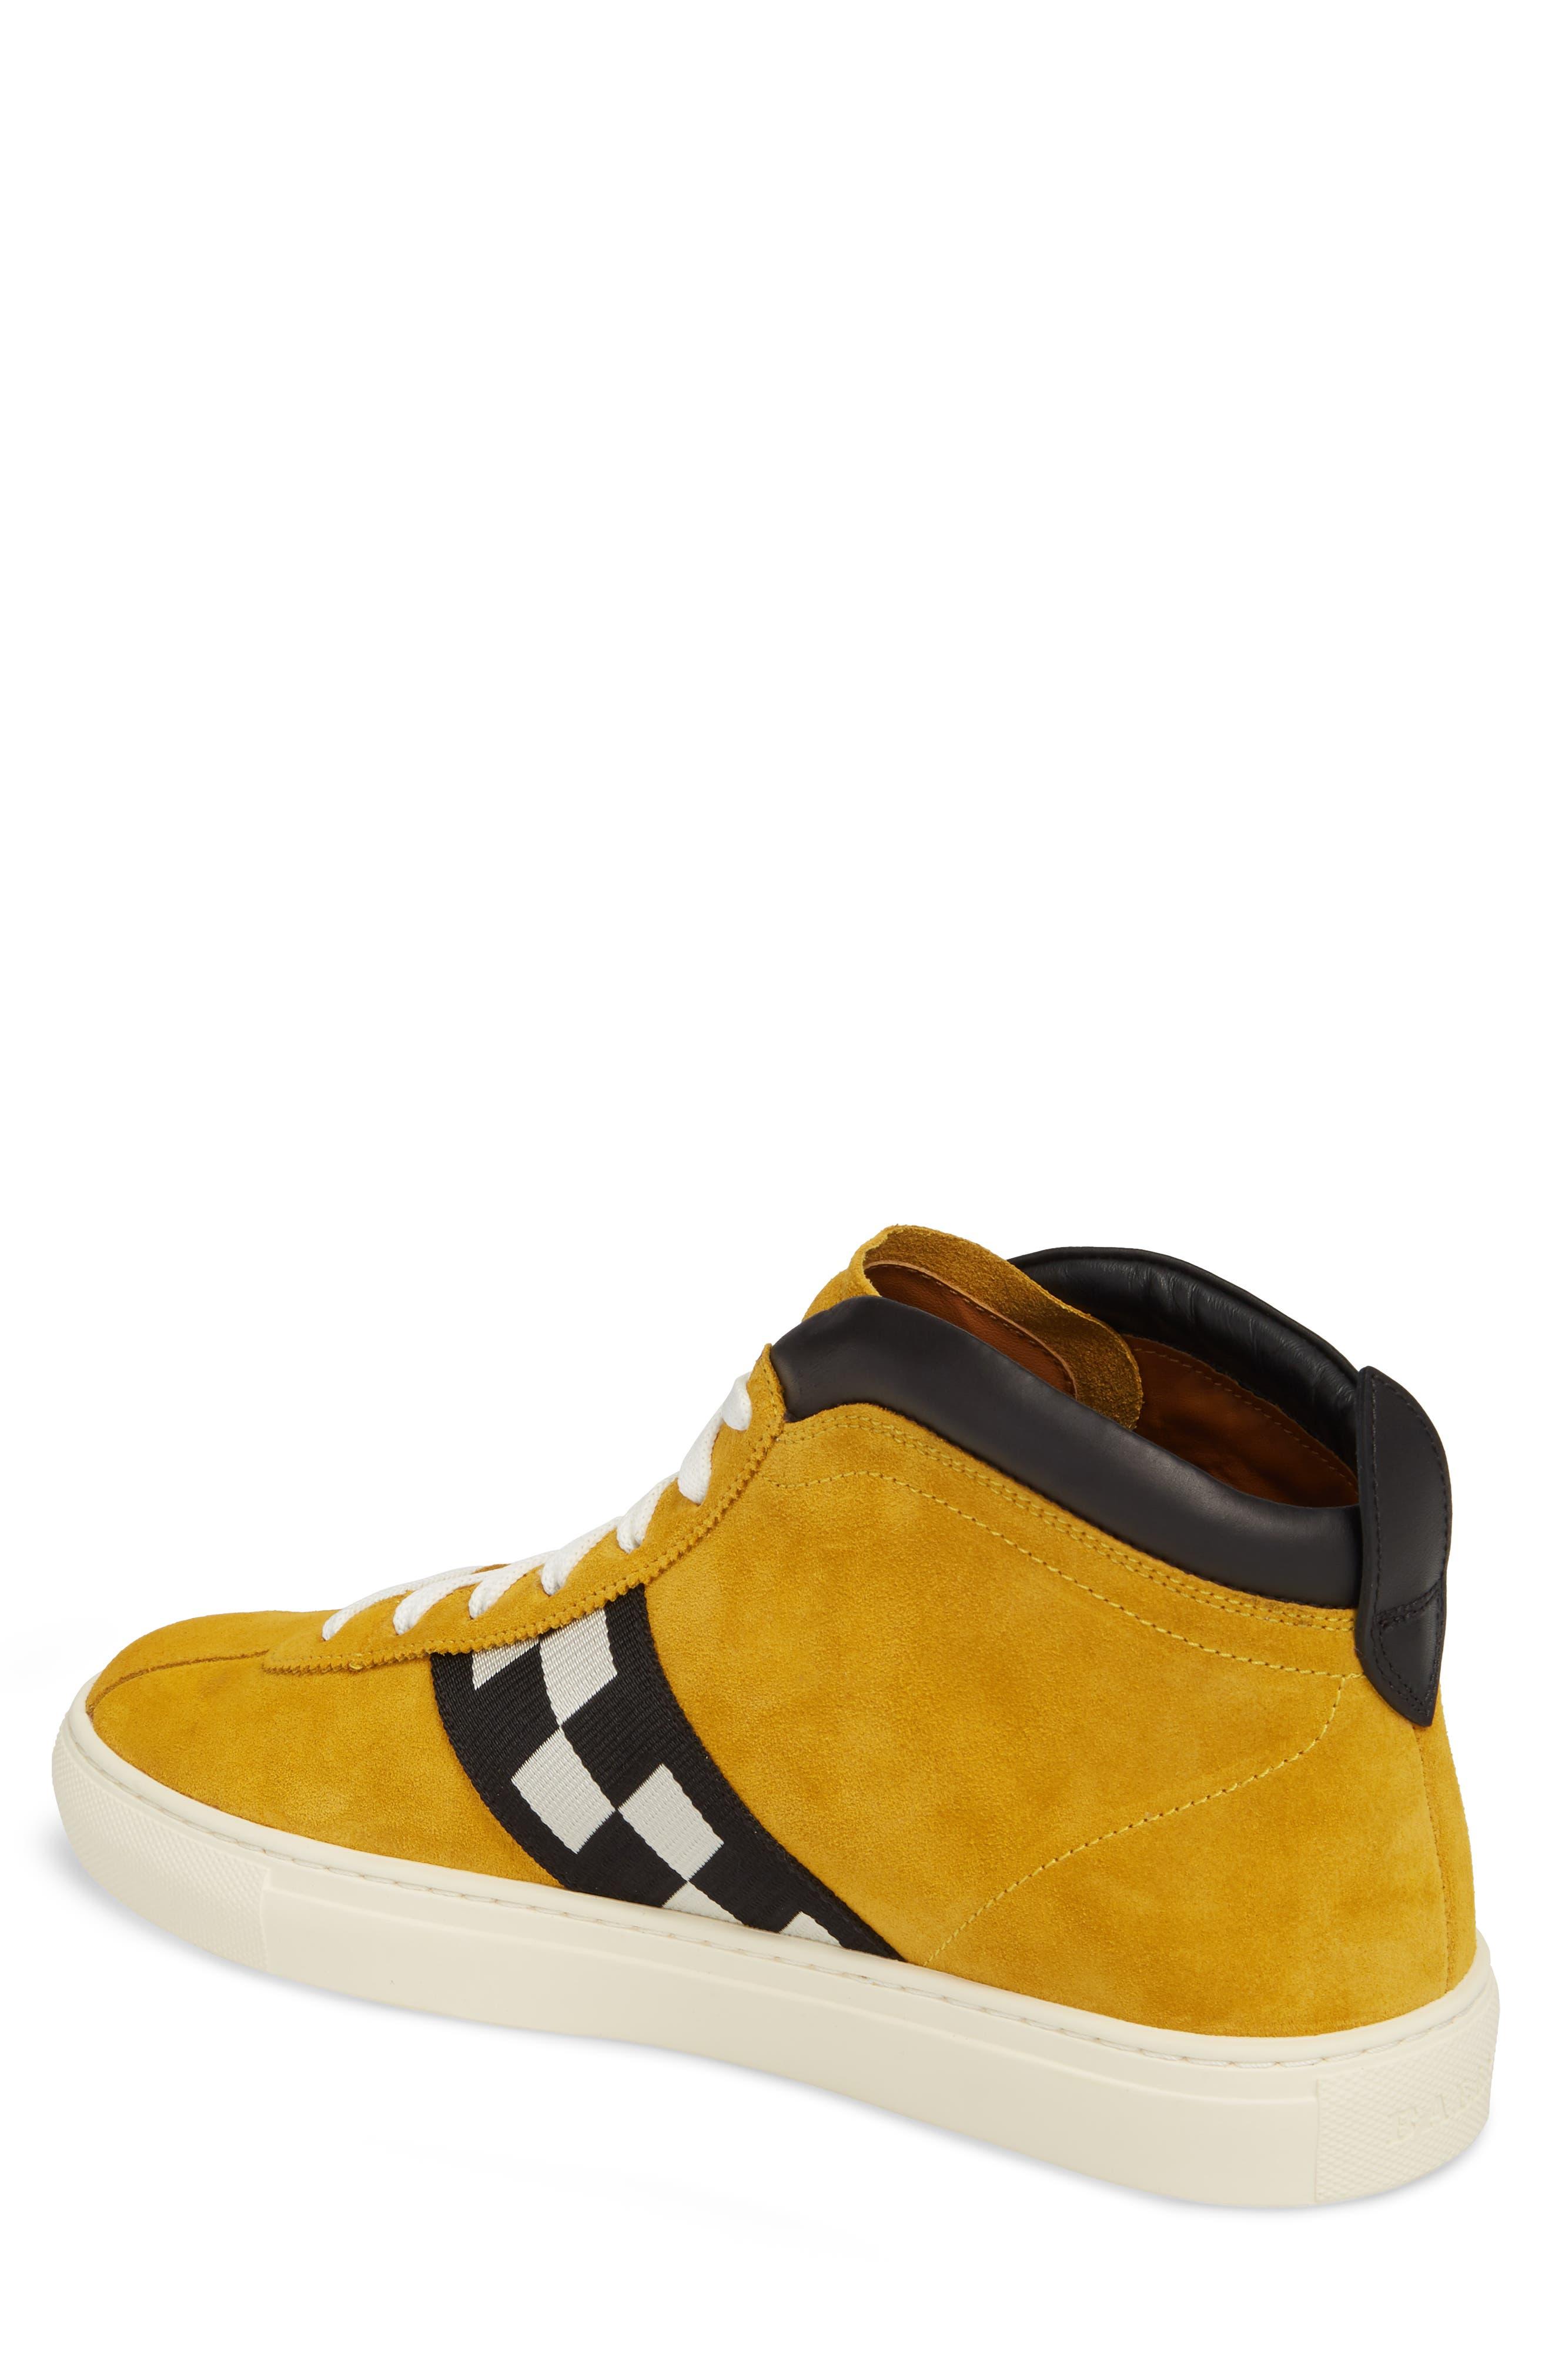 Alternate Image 2  - Bally Vita Checkered High Top Sneaker (Men)